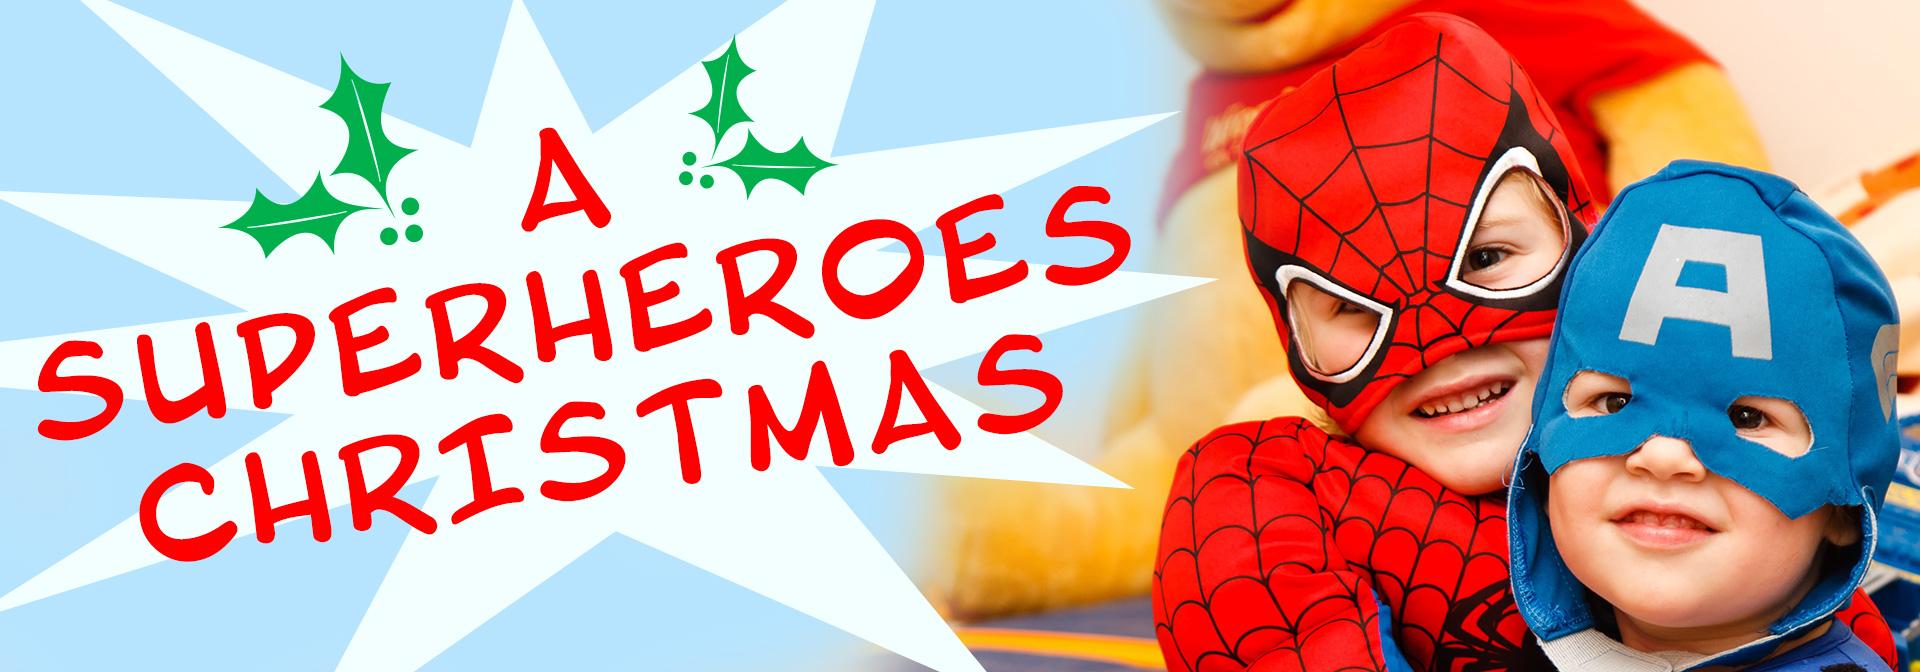 A Superheroes Christmas